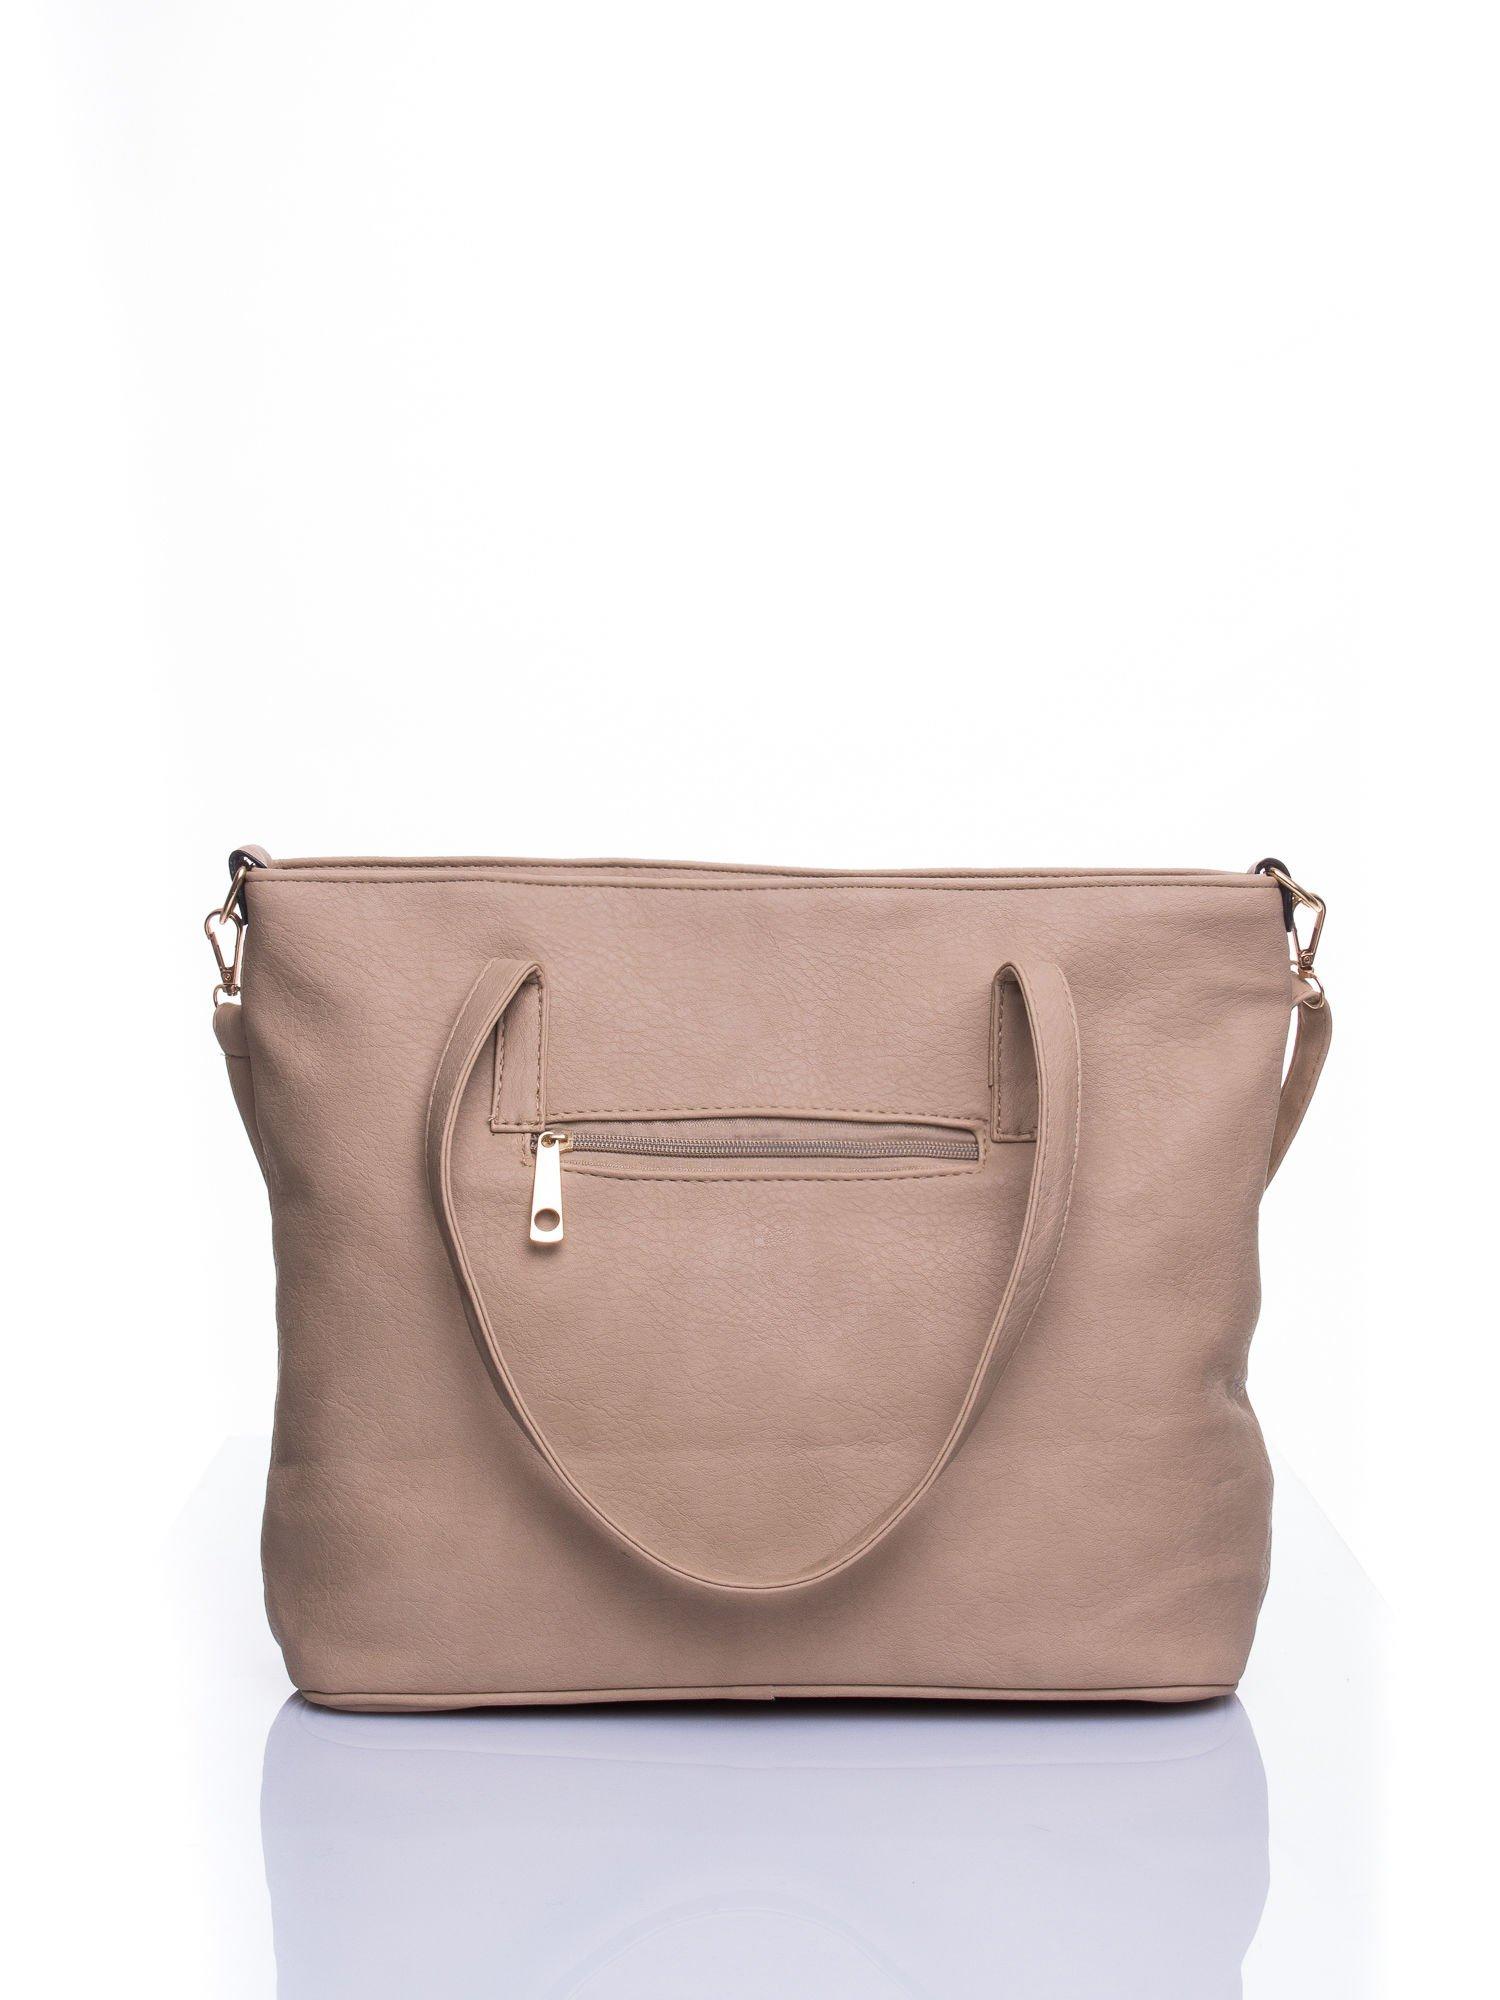 Beżowa fakturowana torba shopper bag                                  zdj.                                  3